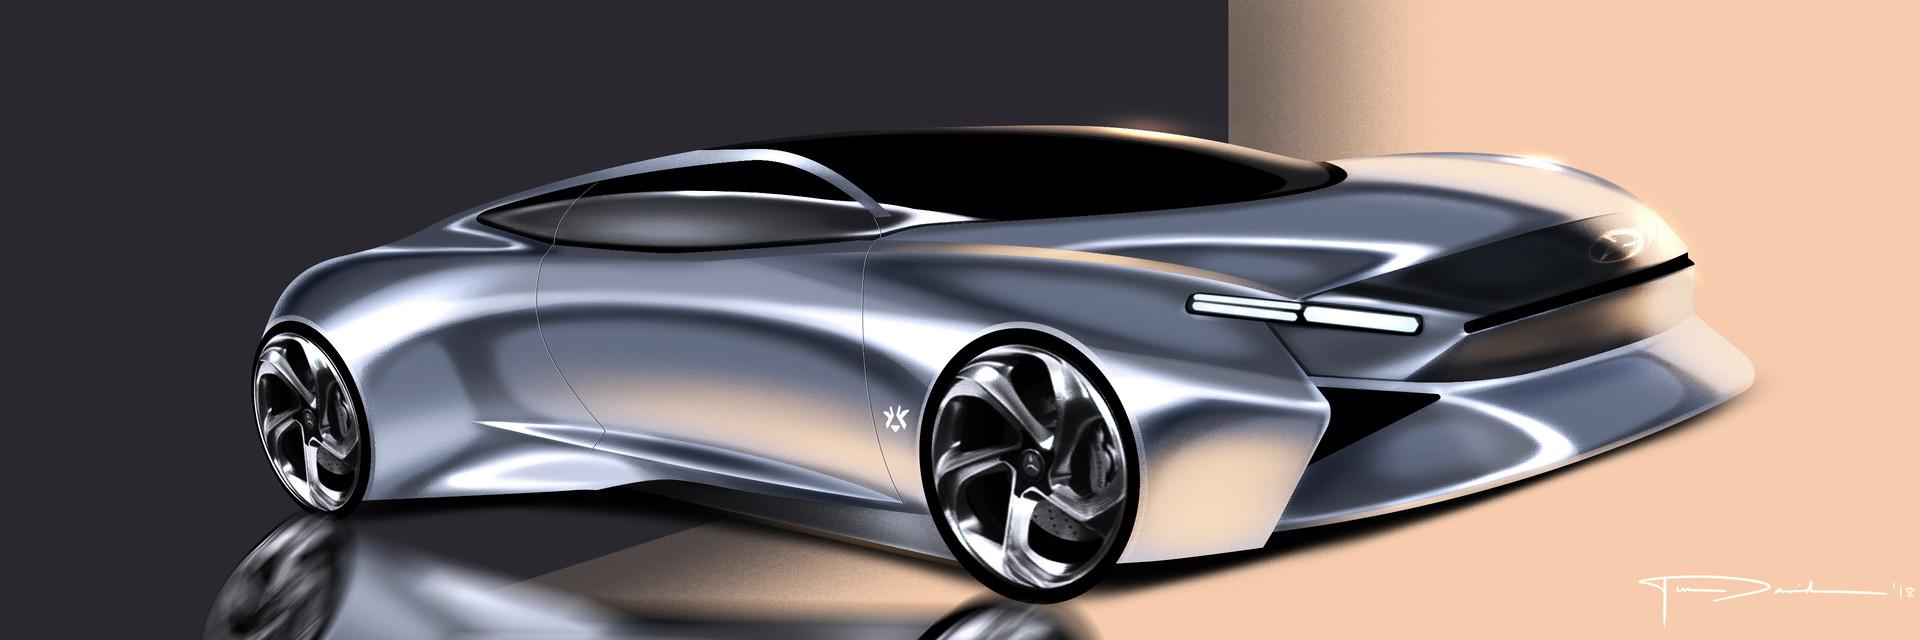 Ilel David Mercedes Concept Sketch Video Tutorial